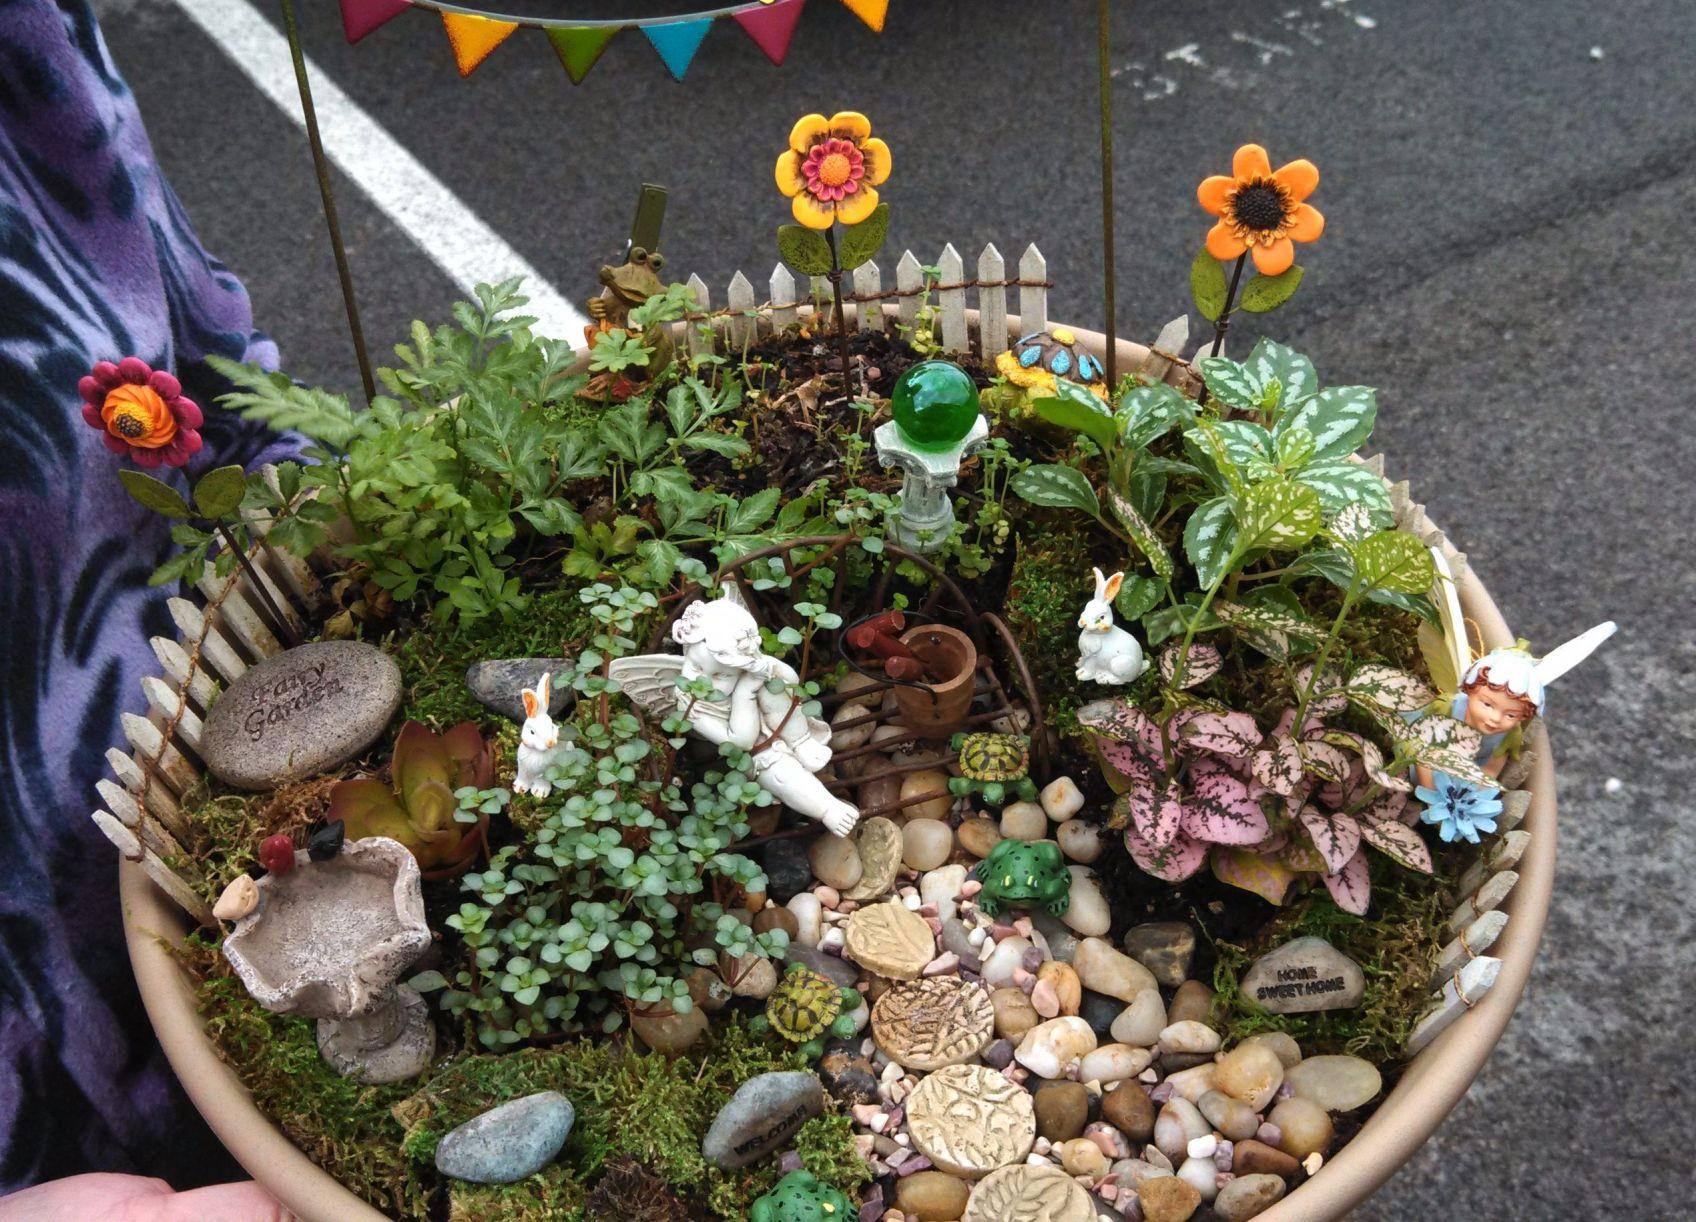 News-Gazette & Great gardening ideas for the dog days of summer   Books ...